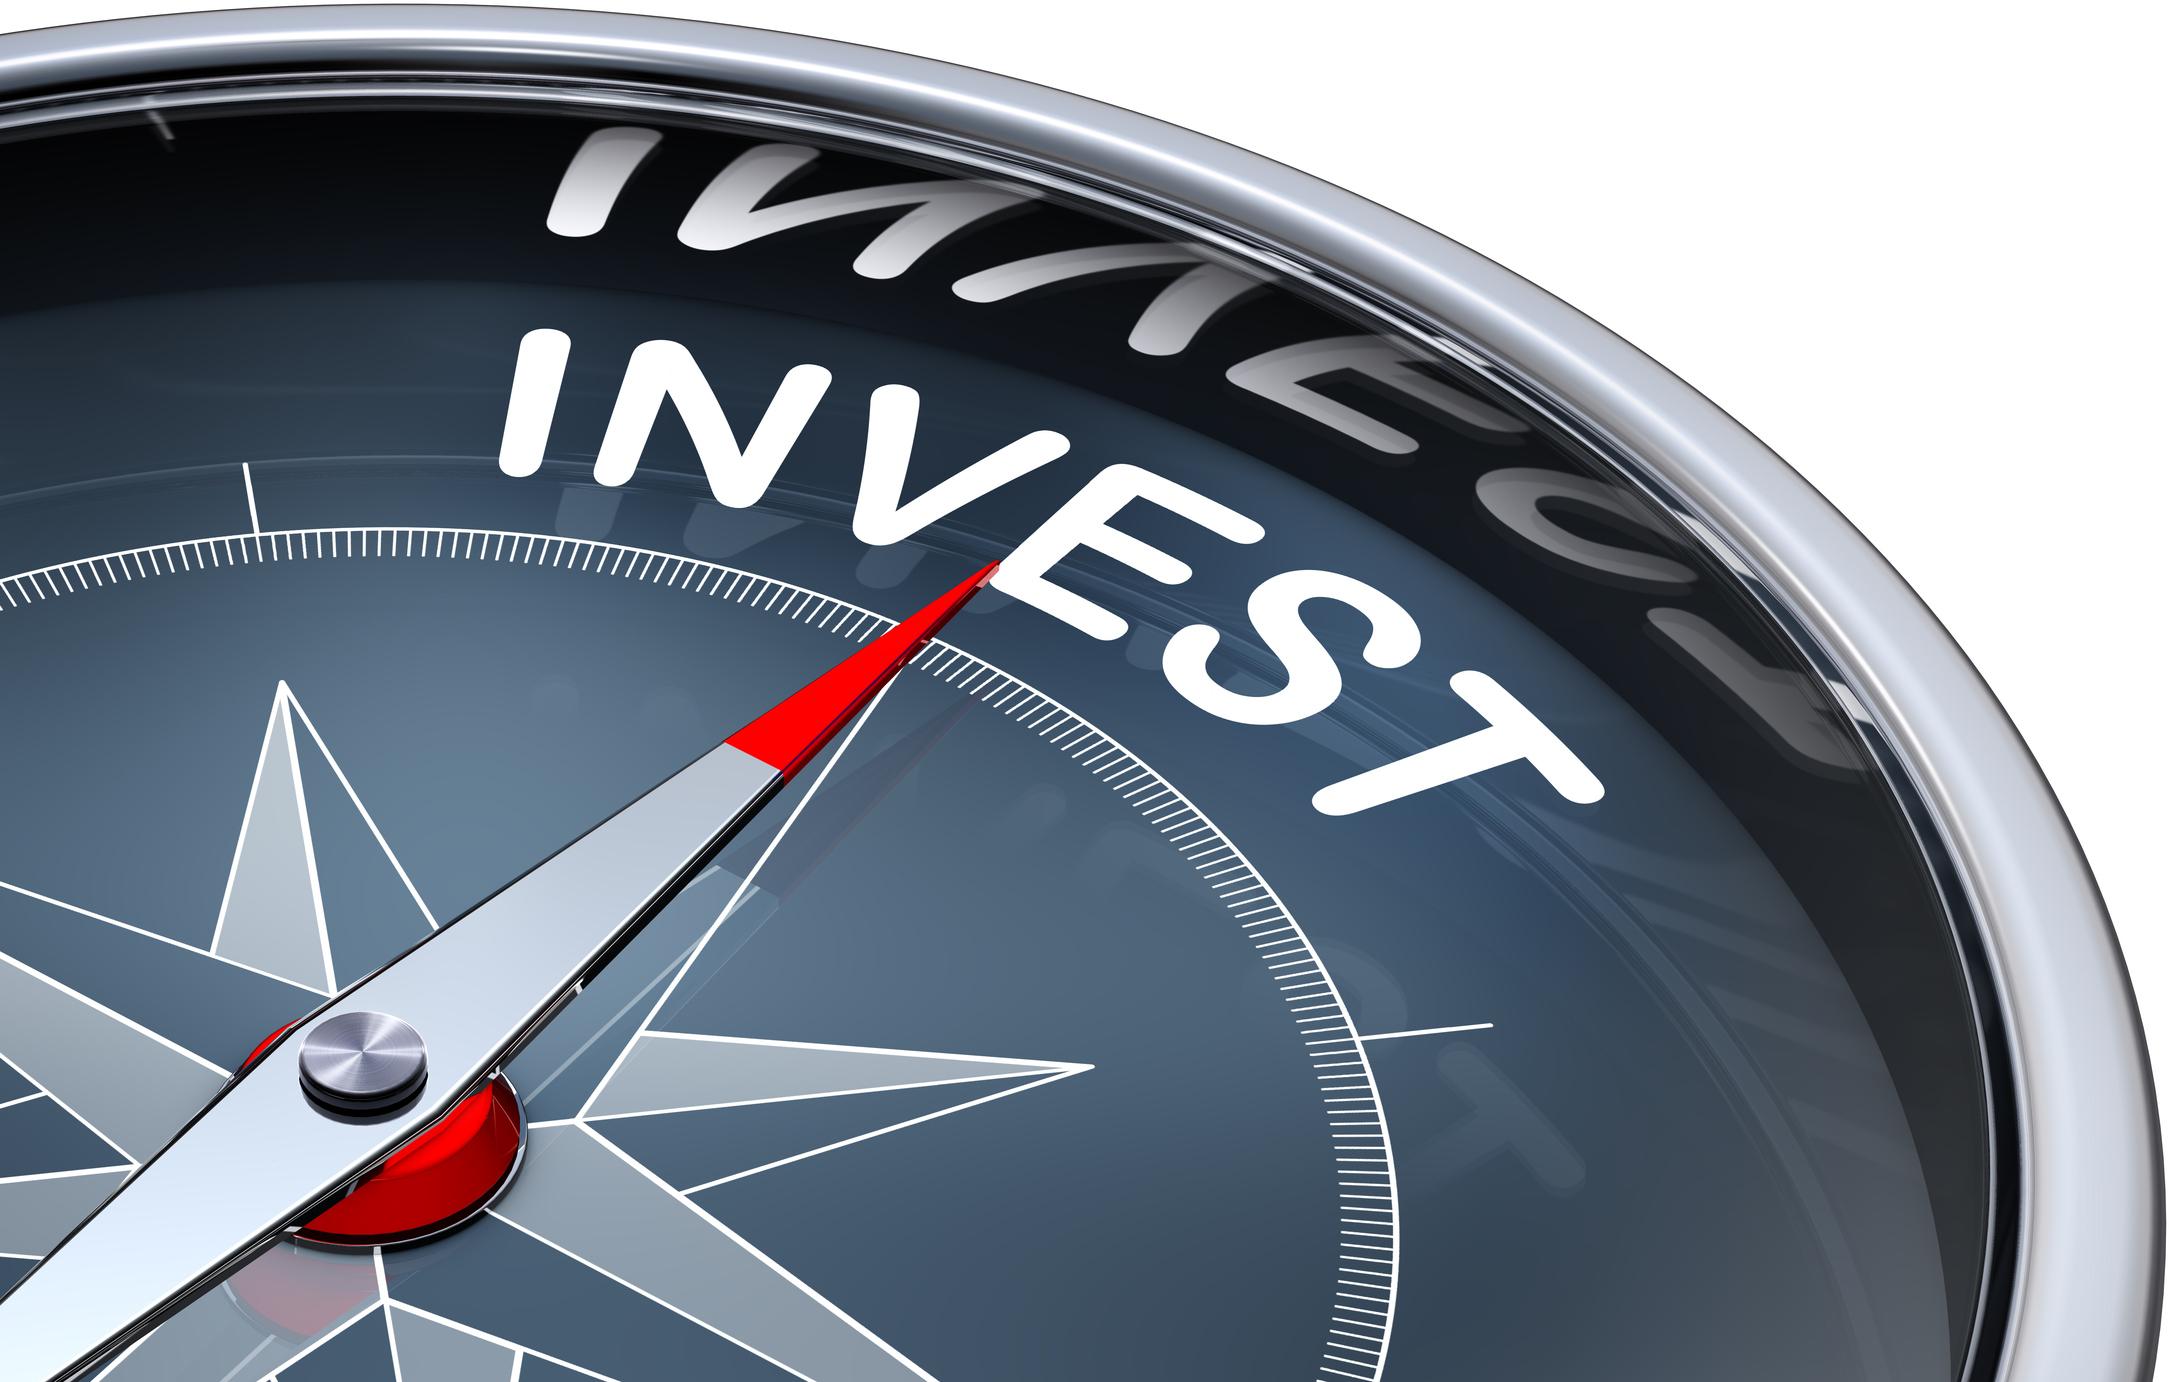 Coronavirus Market Crash: Where to Invest $1,000 Right Now - The Motley Fool